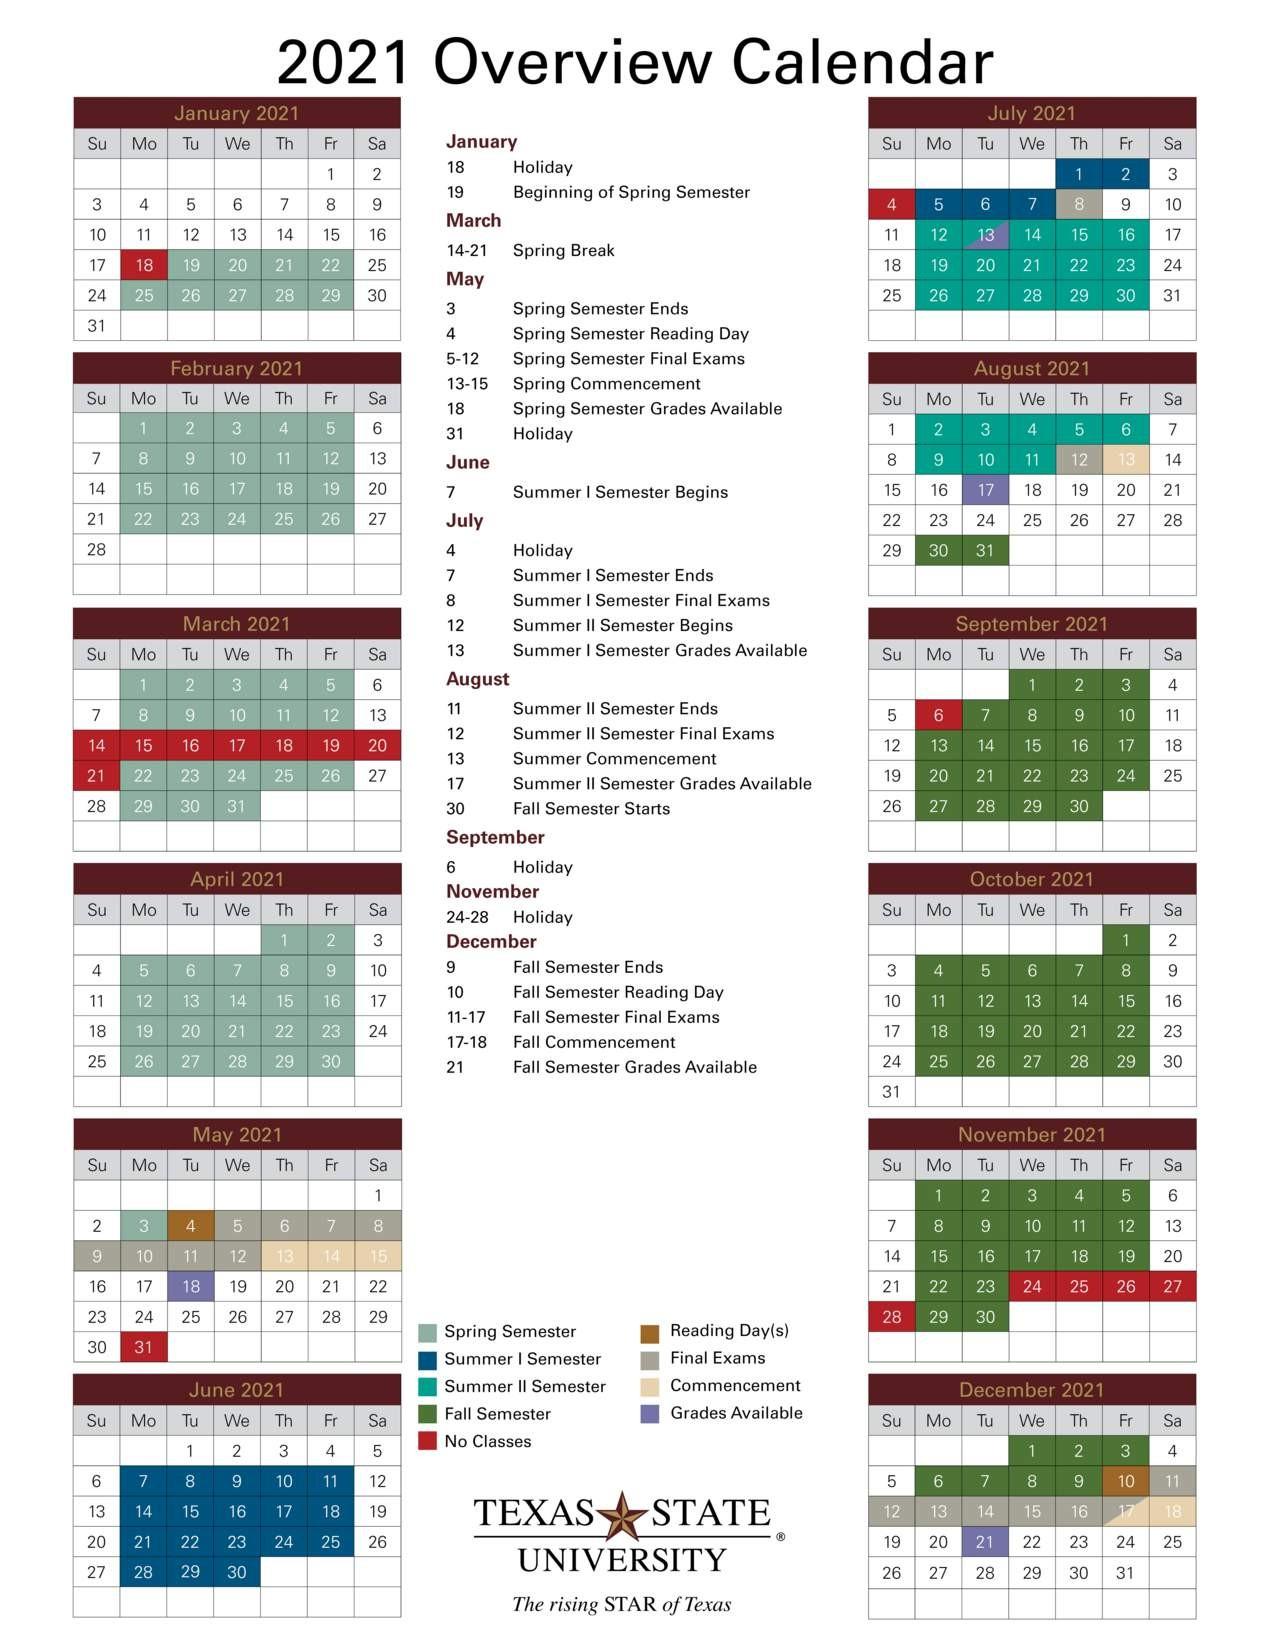 Academic Calendar fice of the University Registrar Texas State University